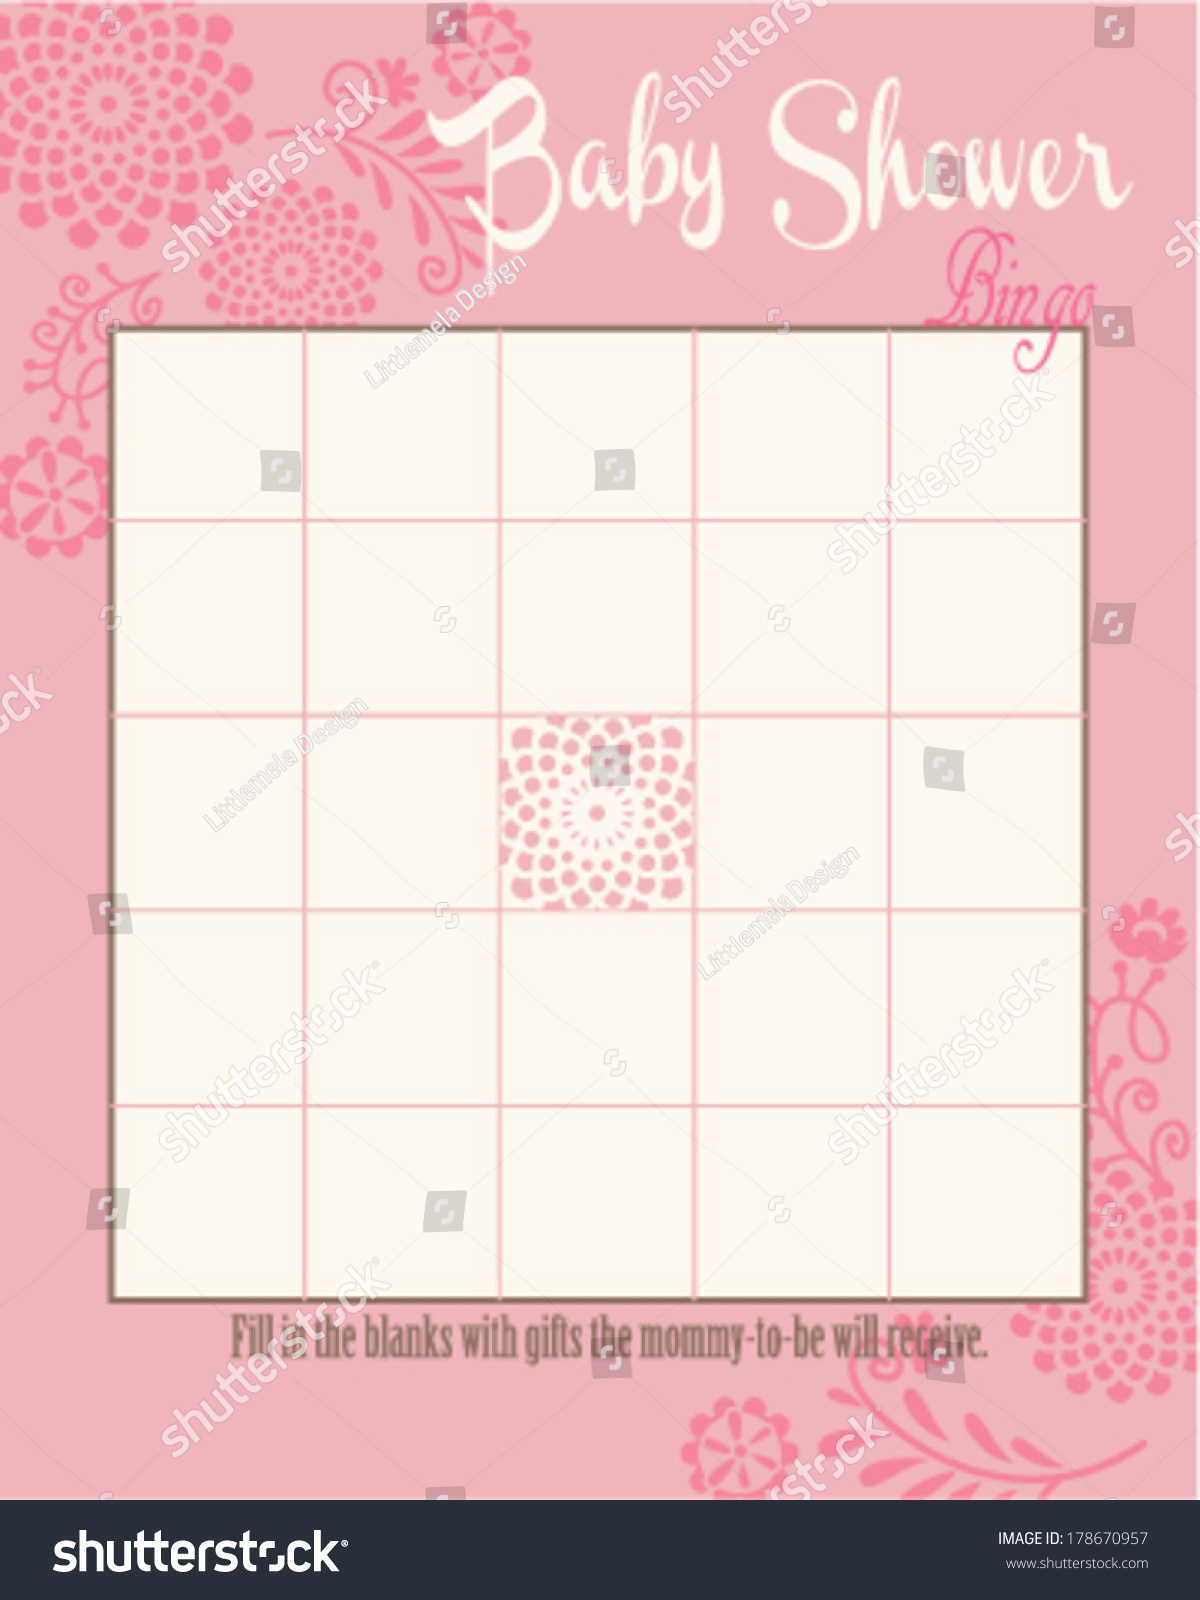 Baby Shower Bingo Game Template Round Stock Vector